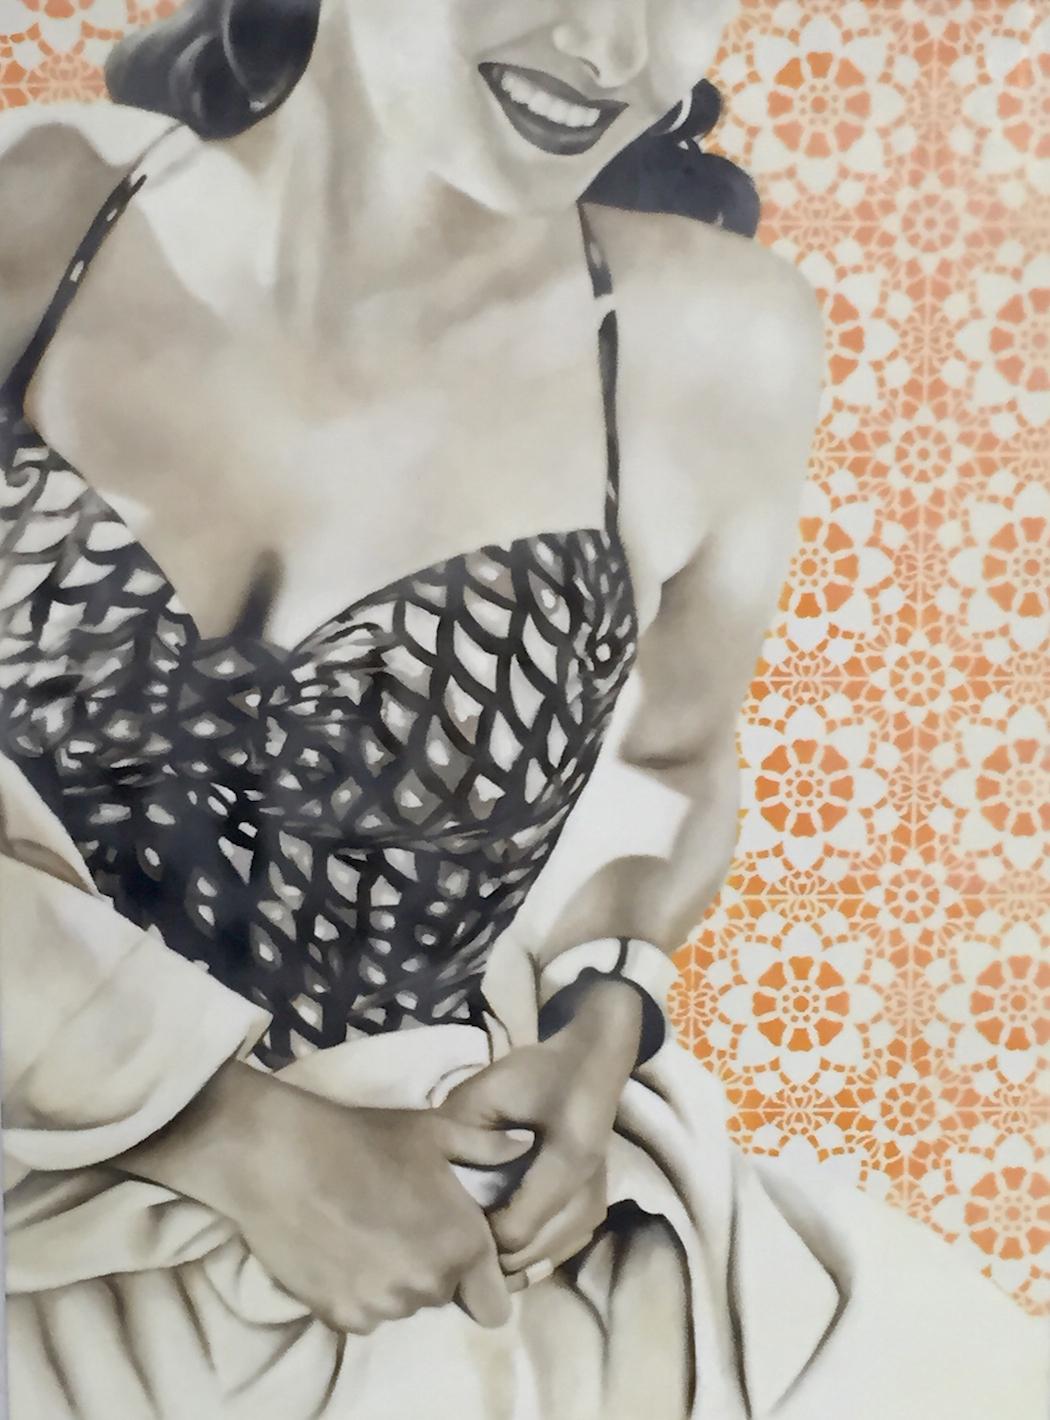 Scalloped Bathingsuit 40x30 (oil and encaustic wax) | Courtesy of Jhina Alvarado